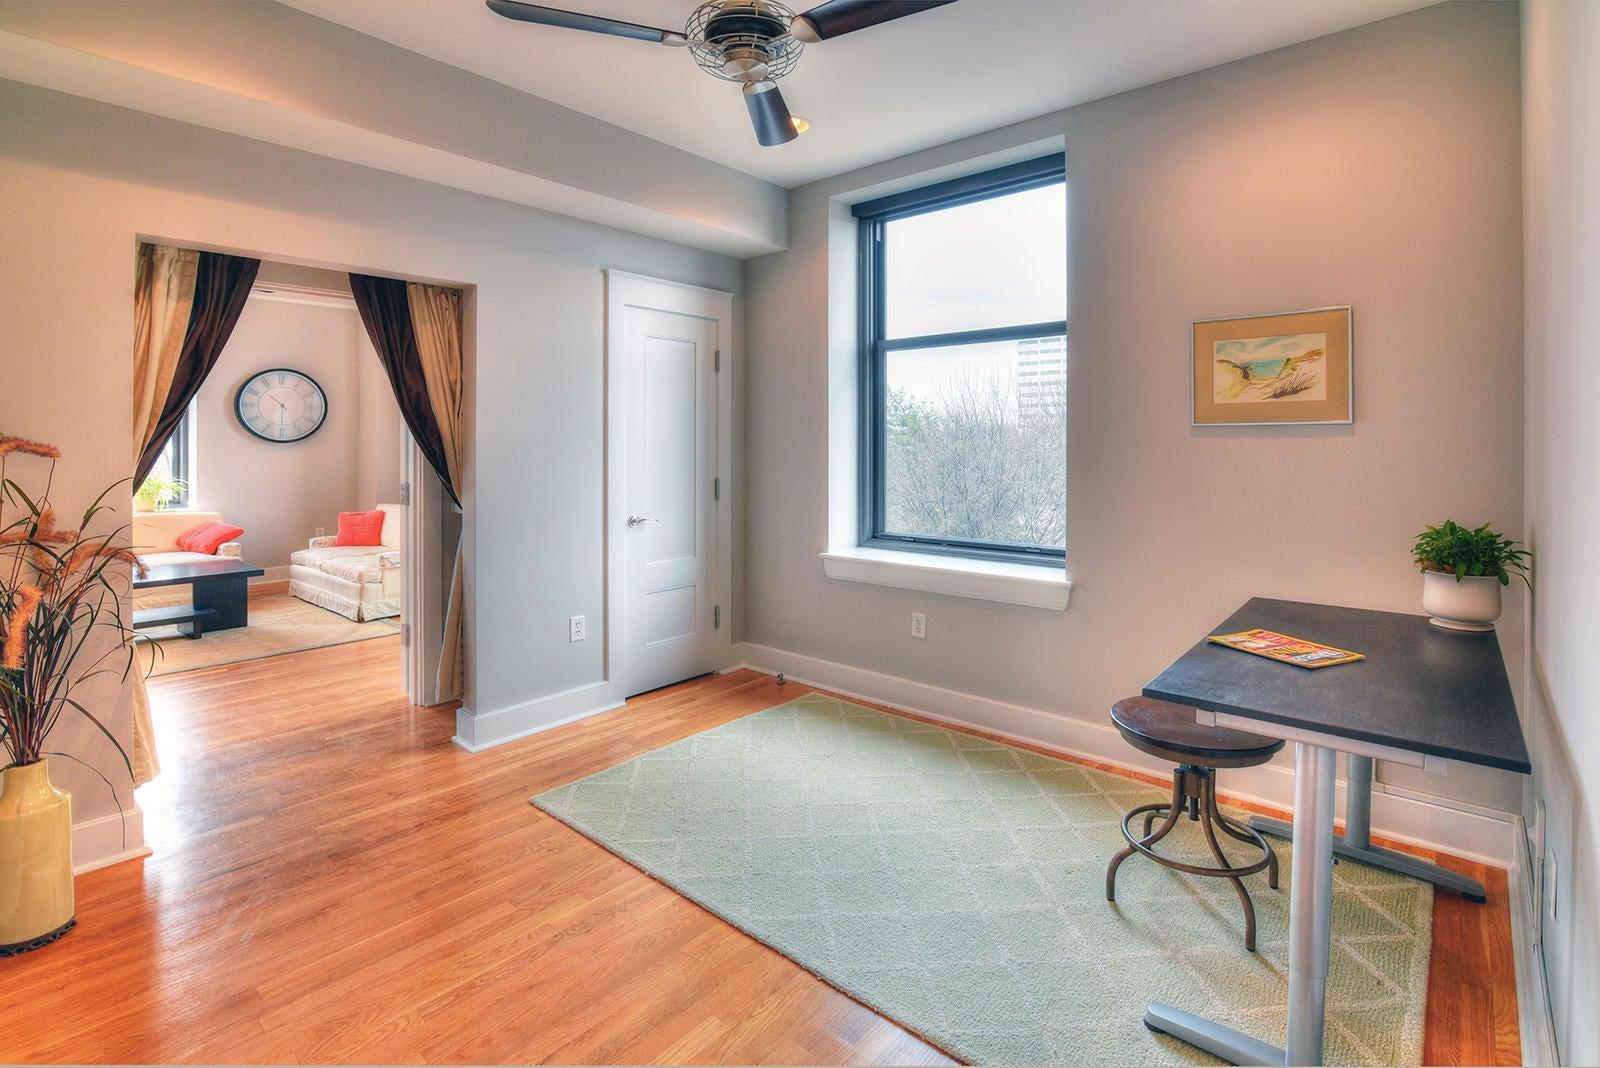 Holston 503 - 18 Bedroom 3 Office